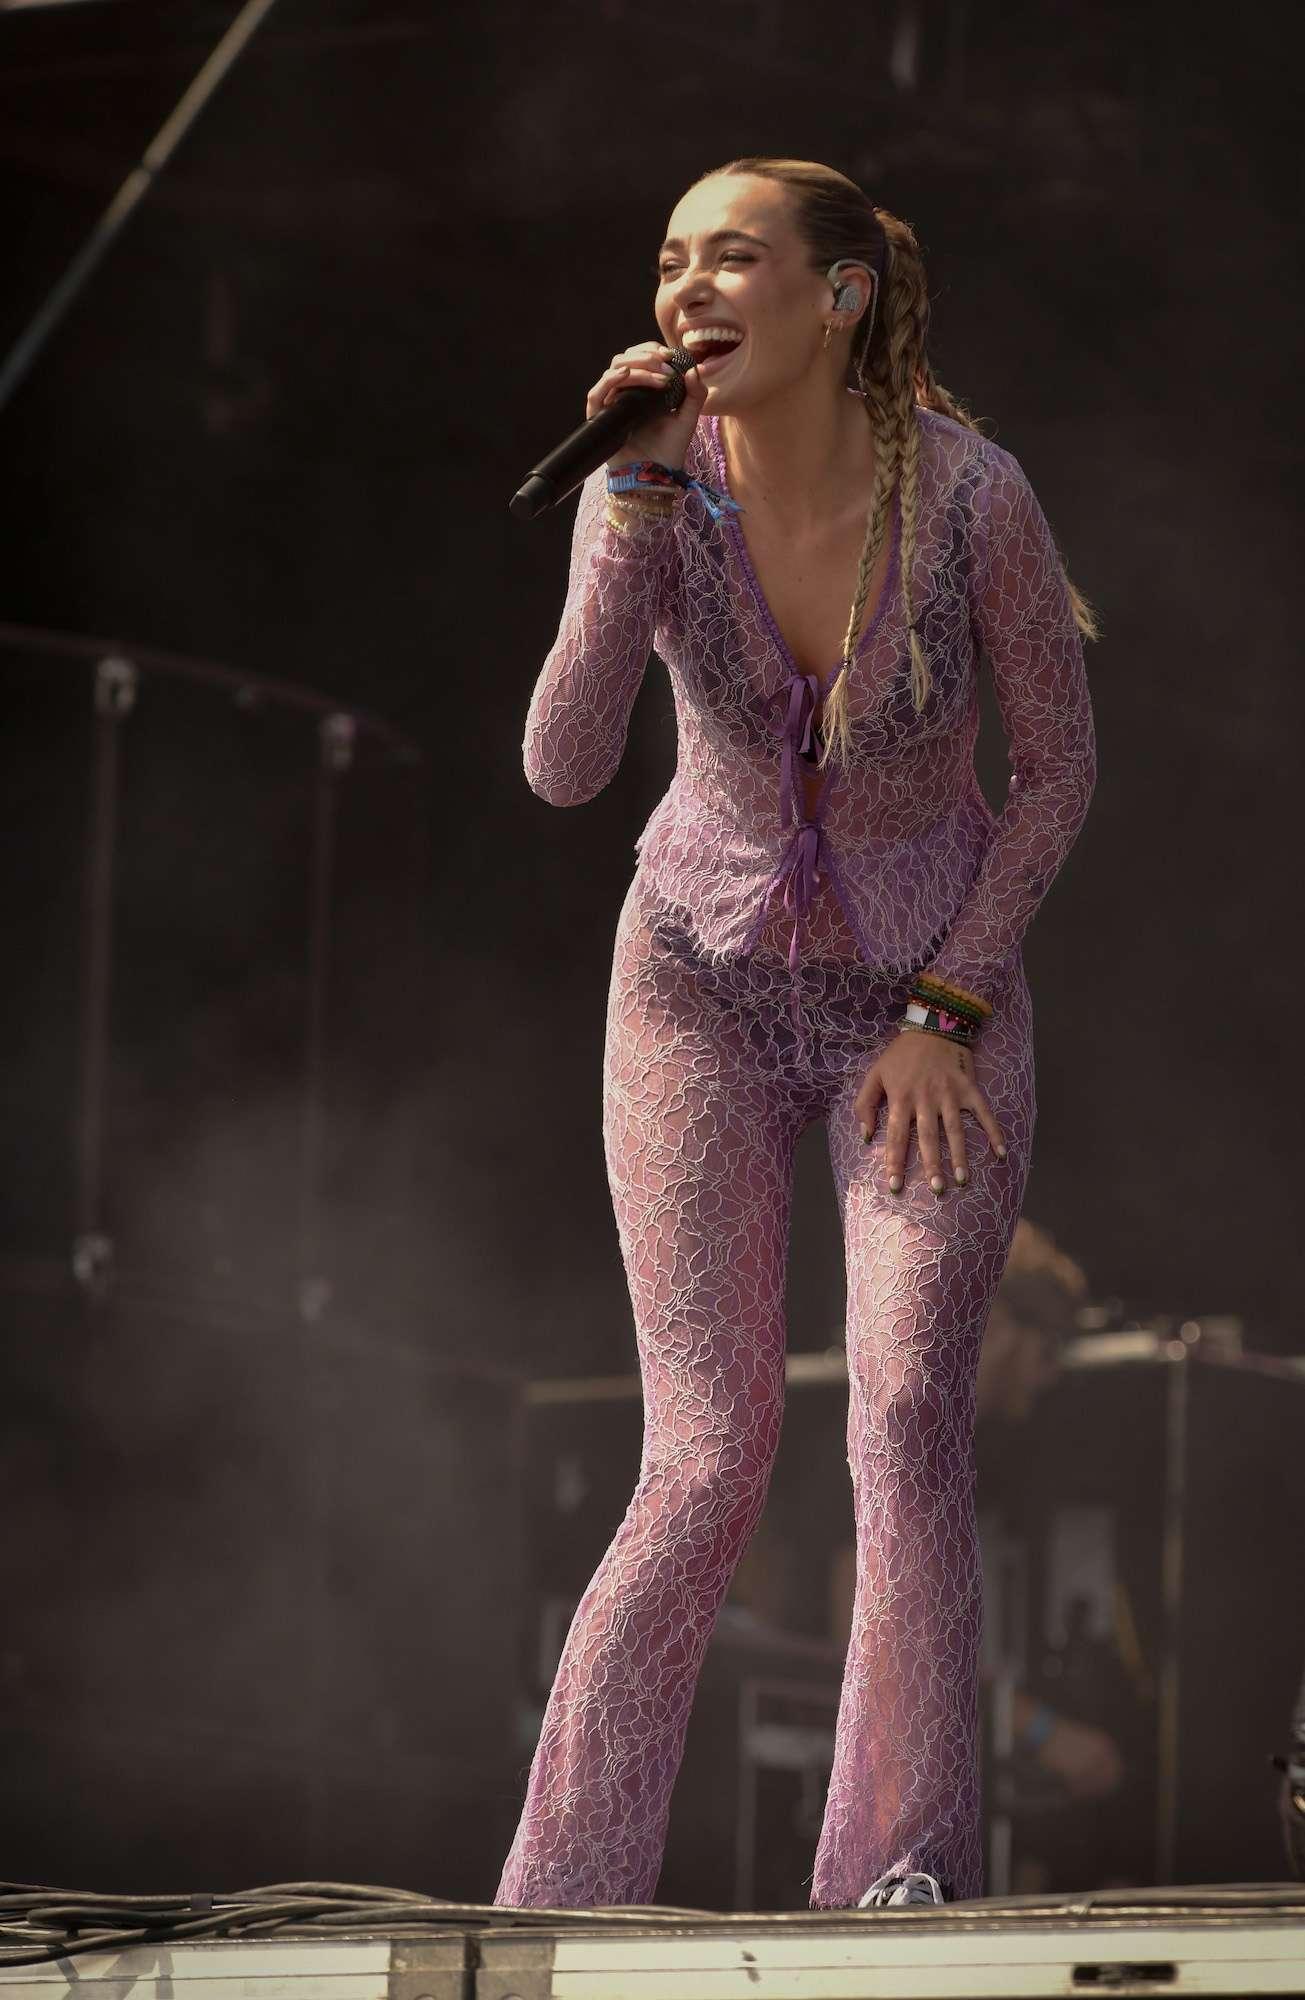 Olivia O'Brien Live at Lollapalooza [GALLERY] 2